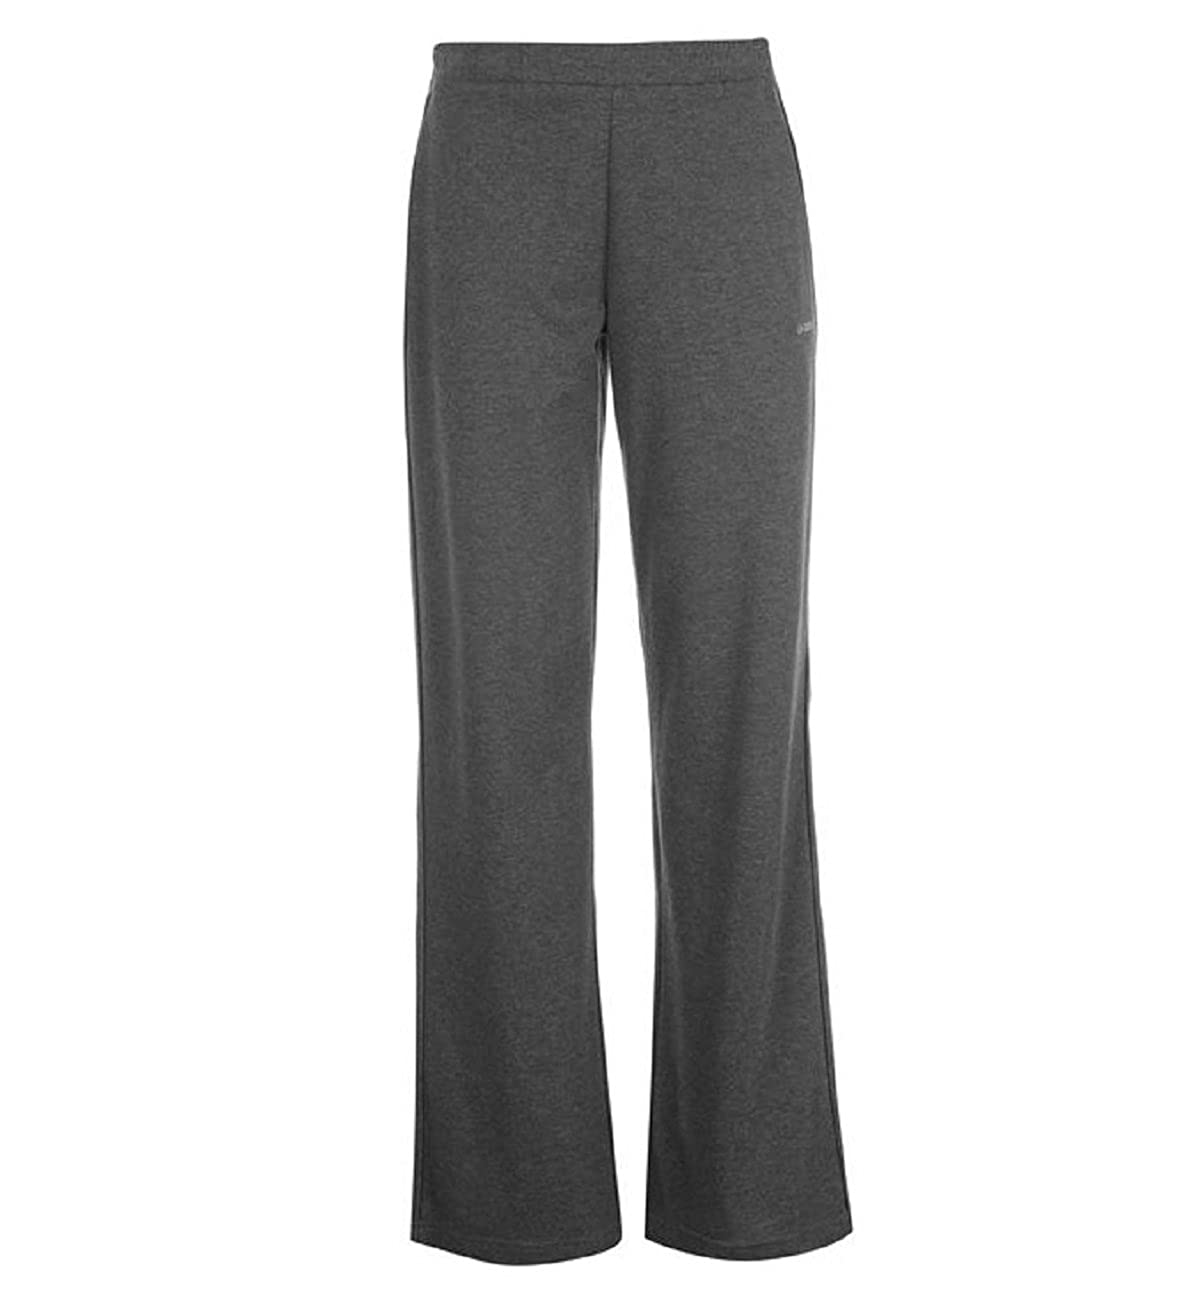 TALLA UK 12. Bluebell Retail Pantalones de chándal para Mujer LA Gear